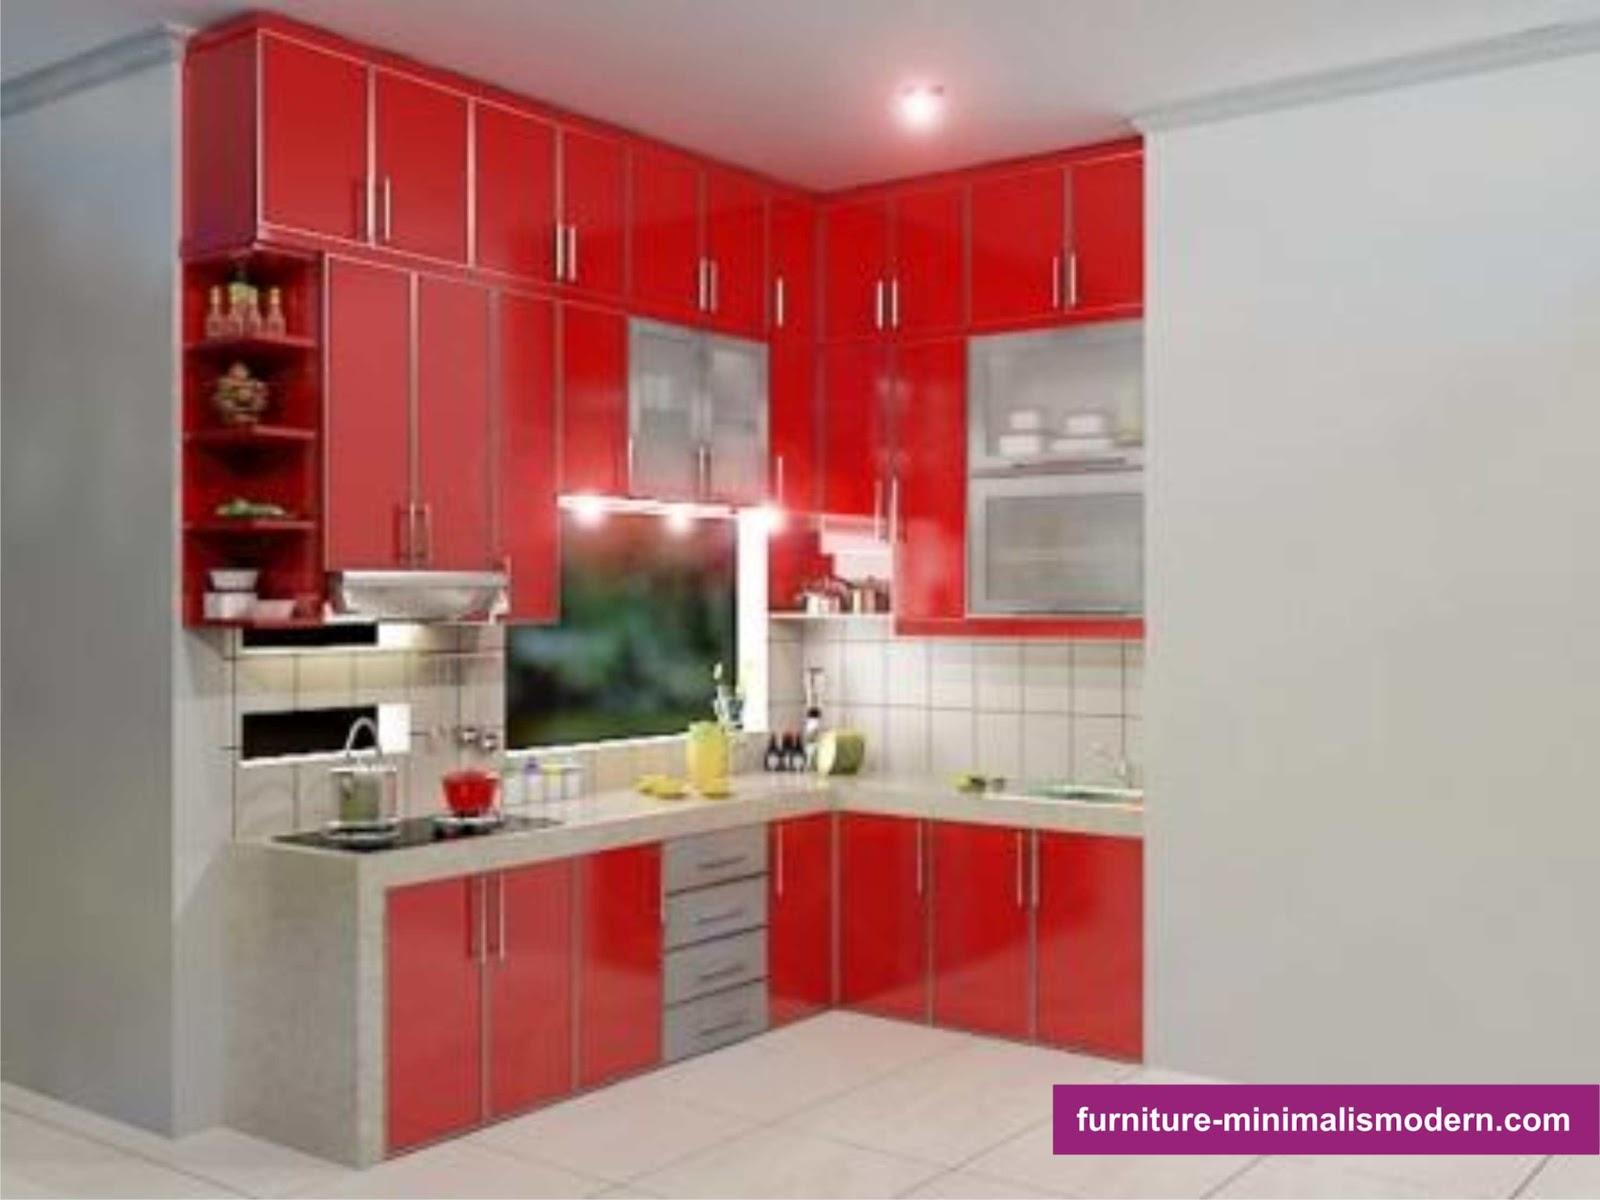 Design furniture tempat dapur modern minimalis dan elegan for Design kitchen set modern